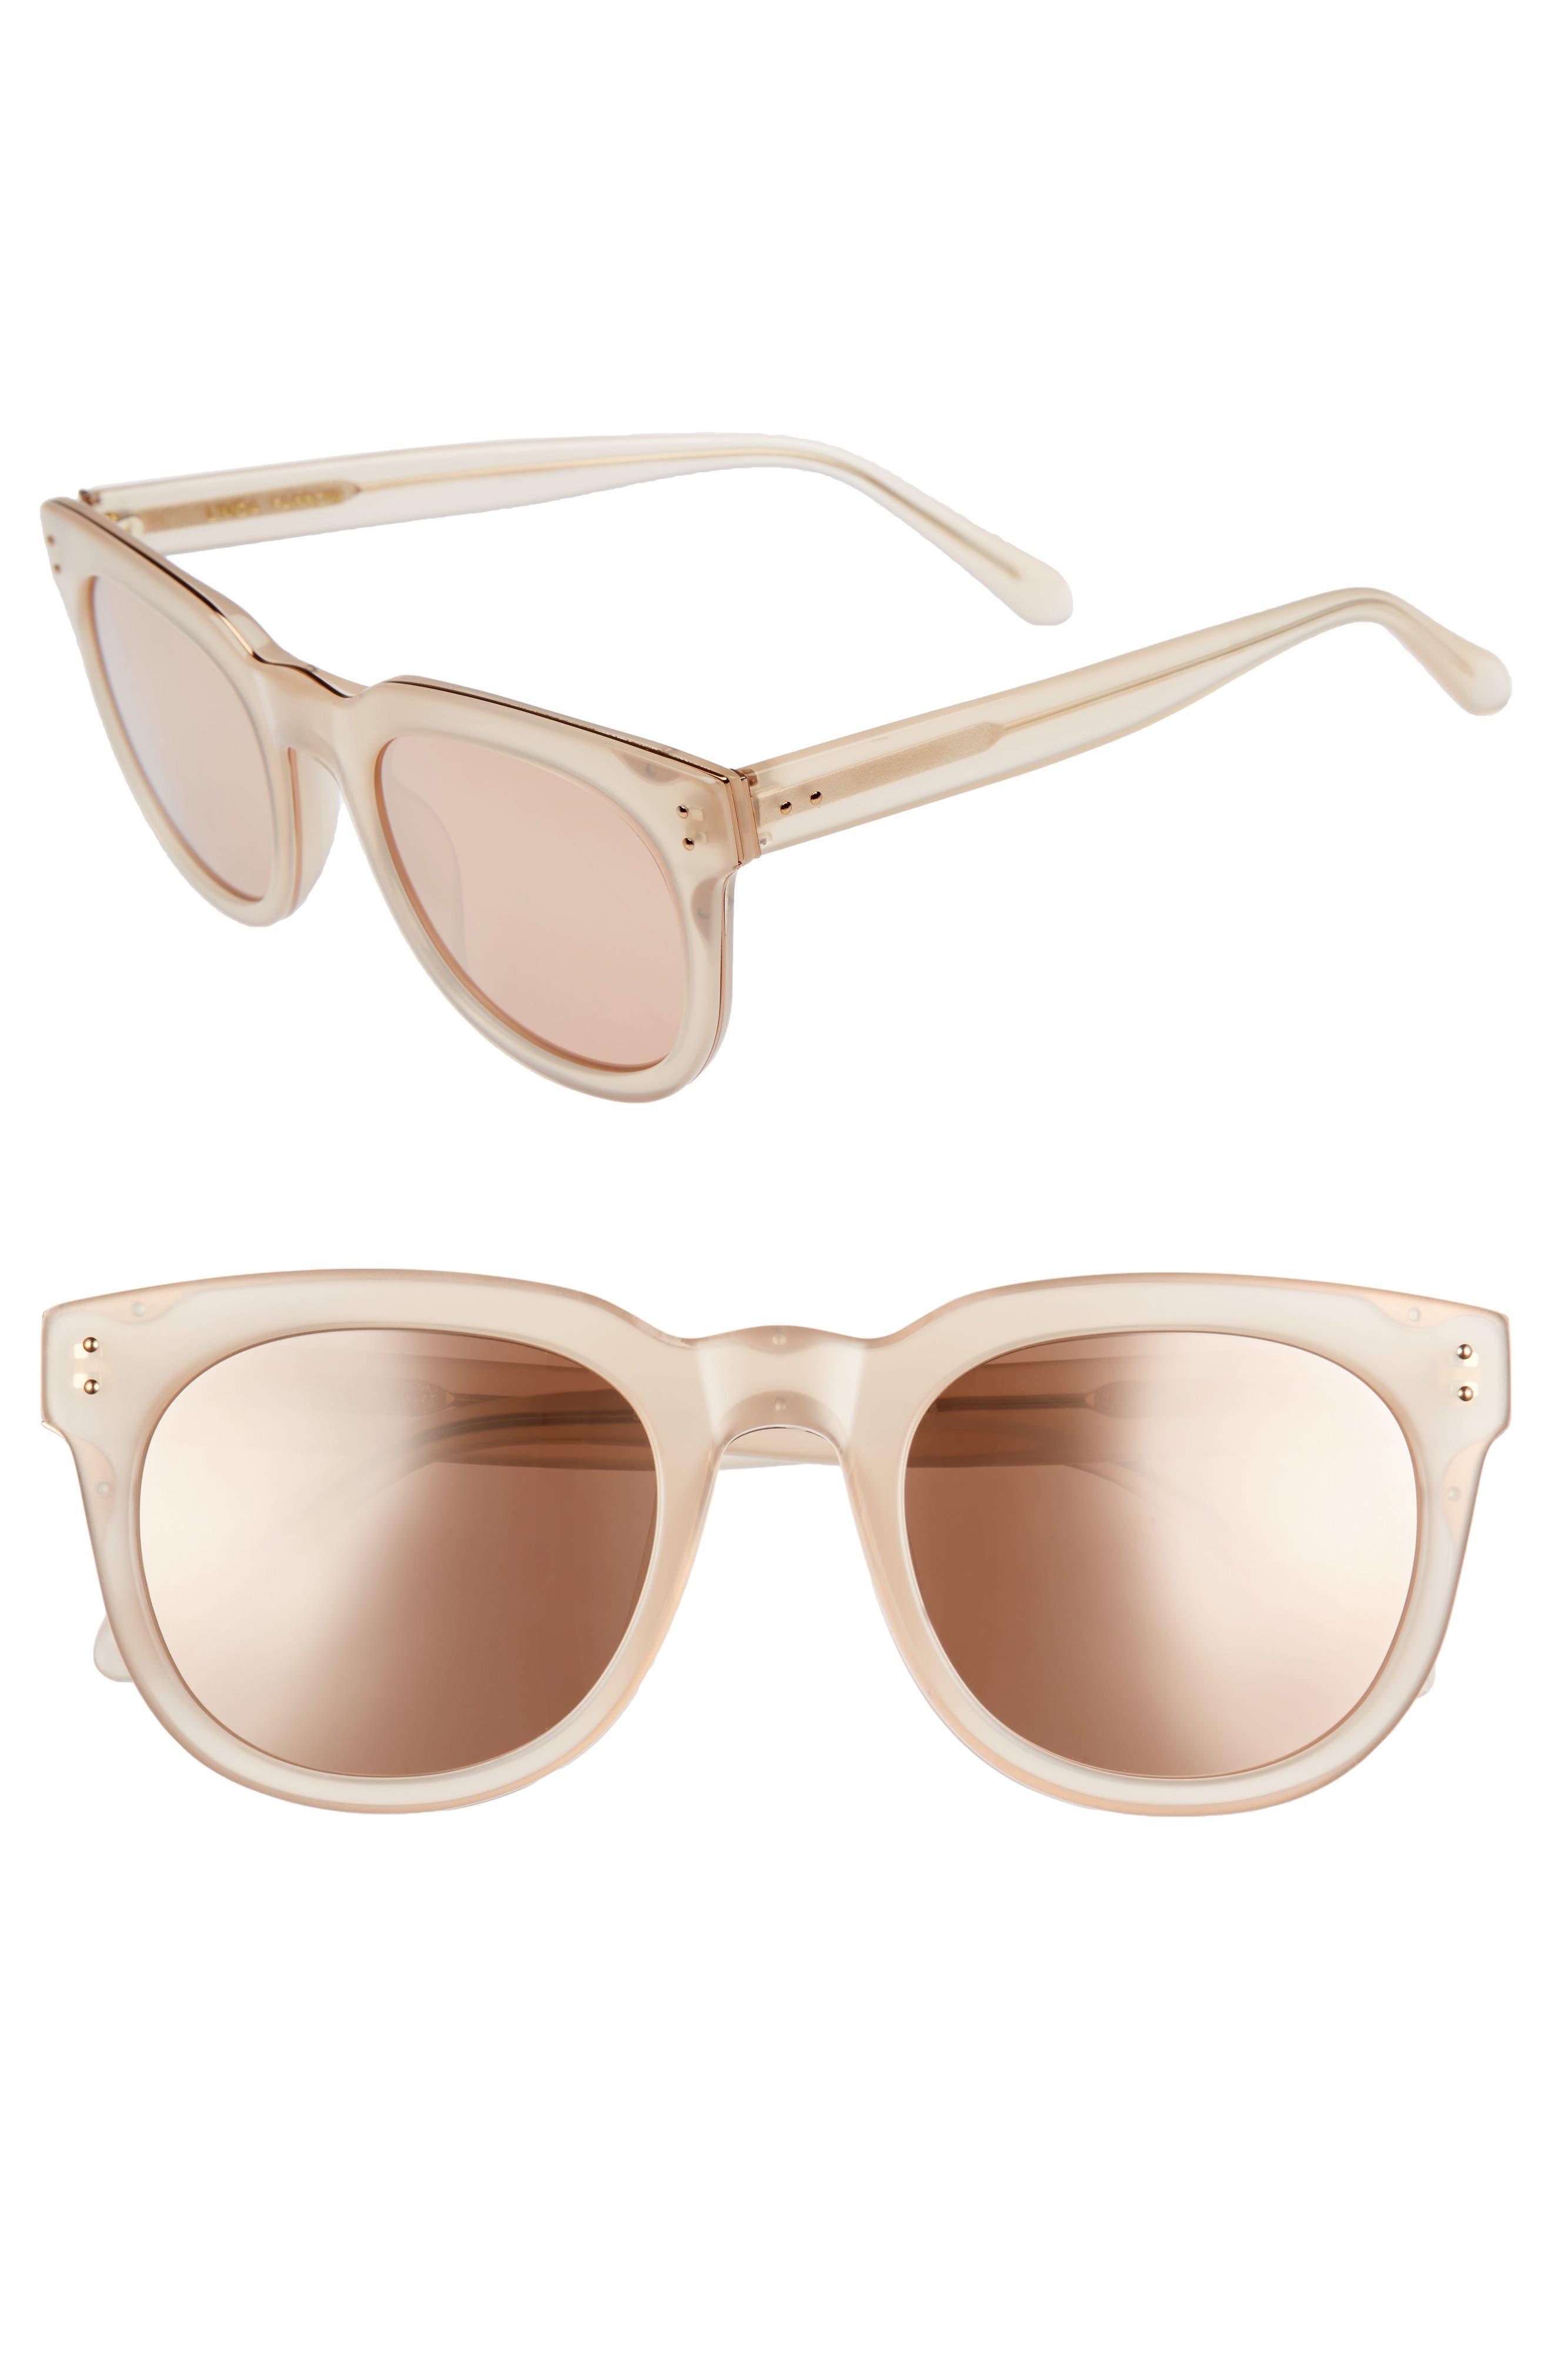 Main Image - Linda Farrow 50mm D-Frame Mirrored Sunglasses